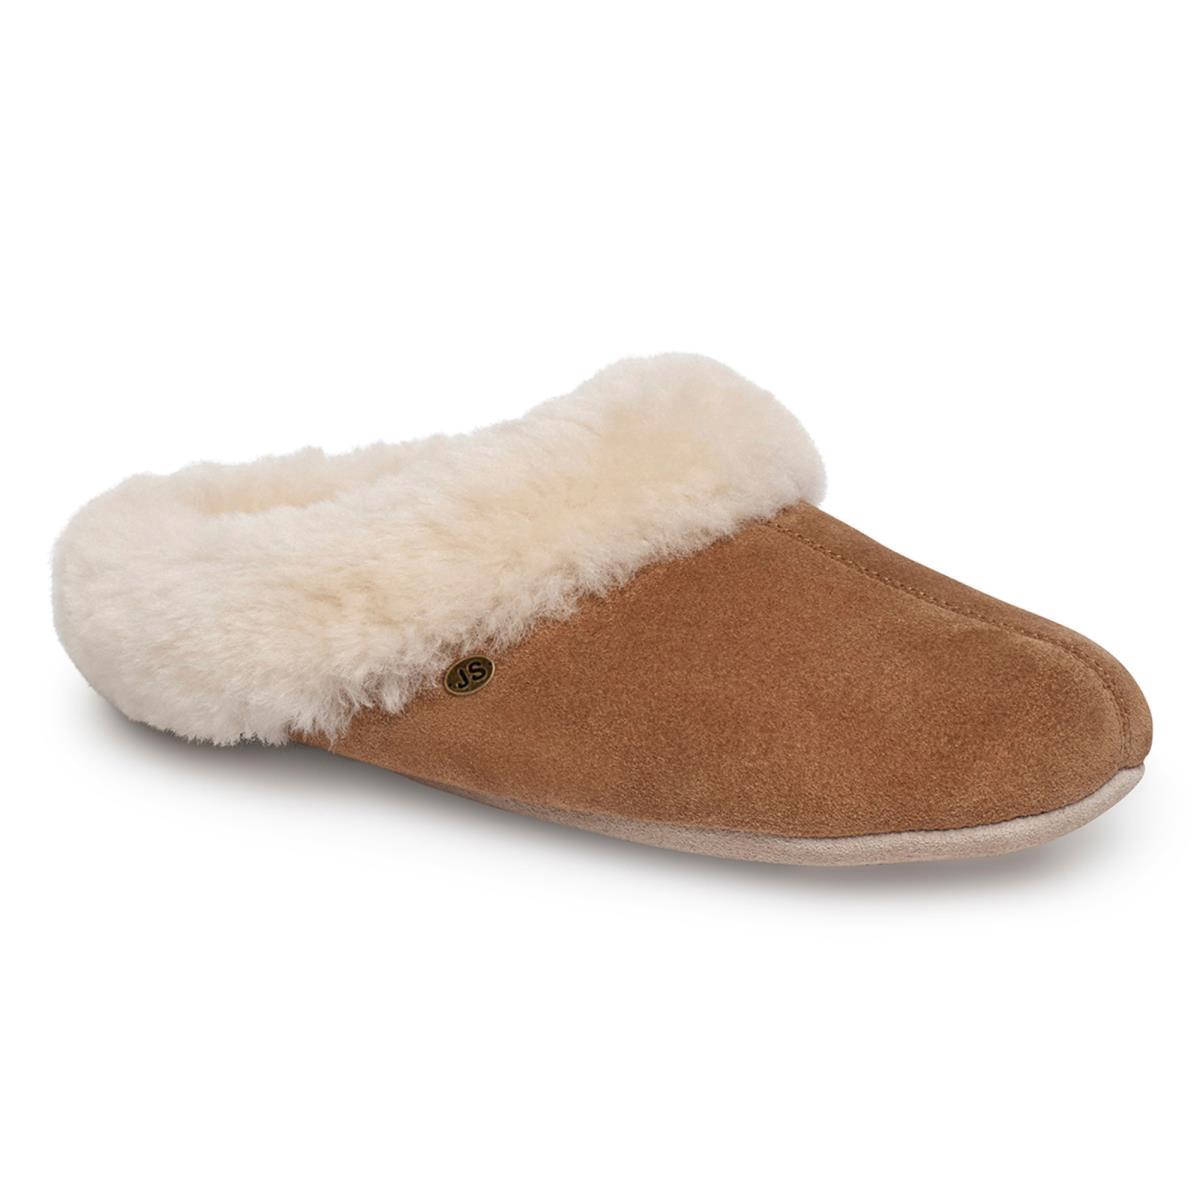 how to make sheepskin slippers